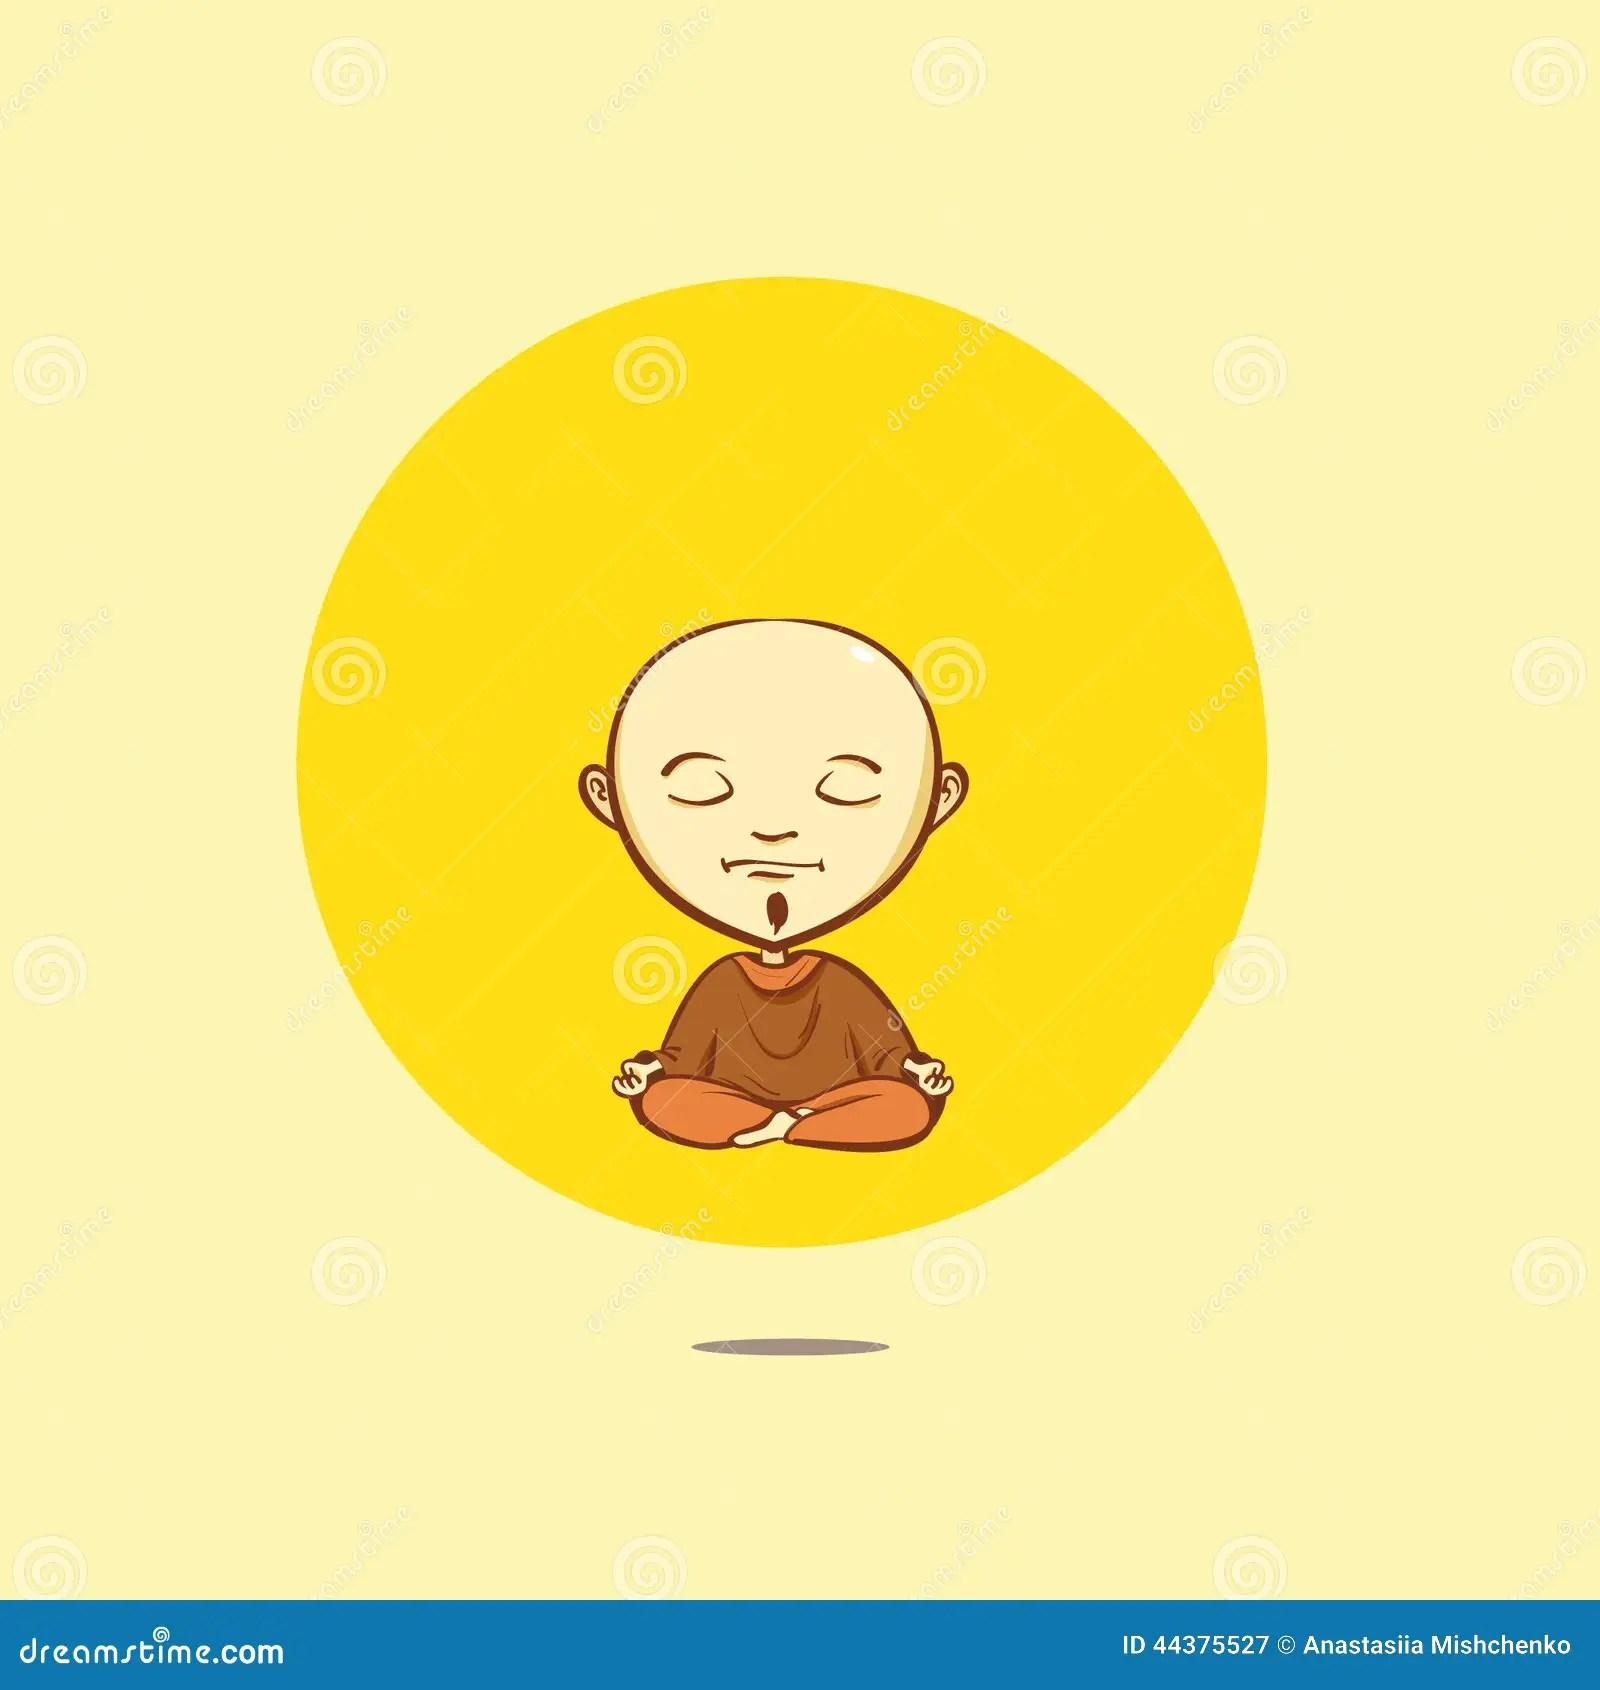 Cute Cartoon Boy Wallpaper Vector Cartoon Buddhist Monk Stock Vector Image 44375527